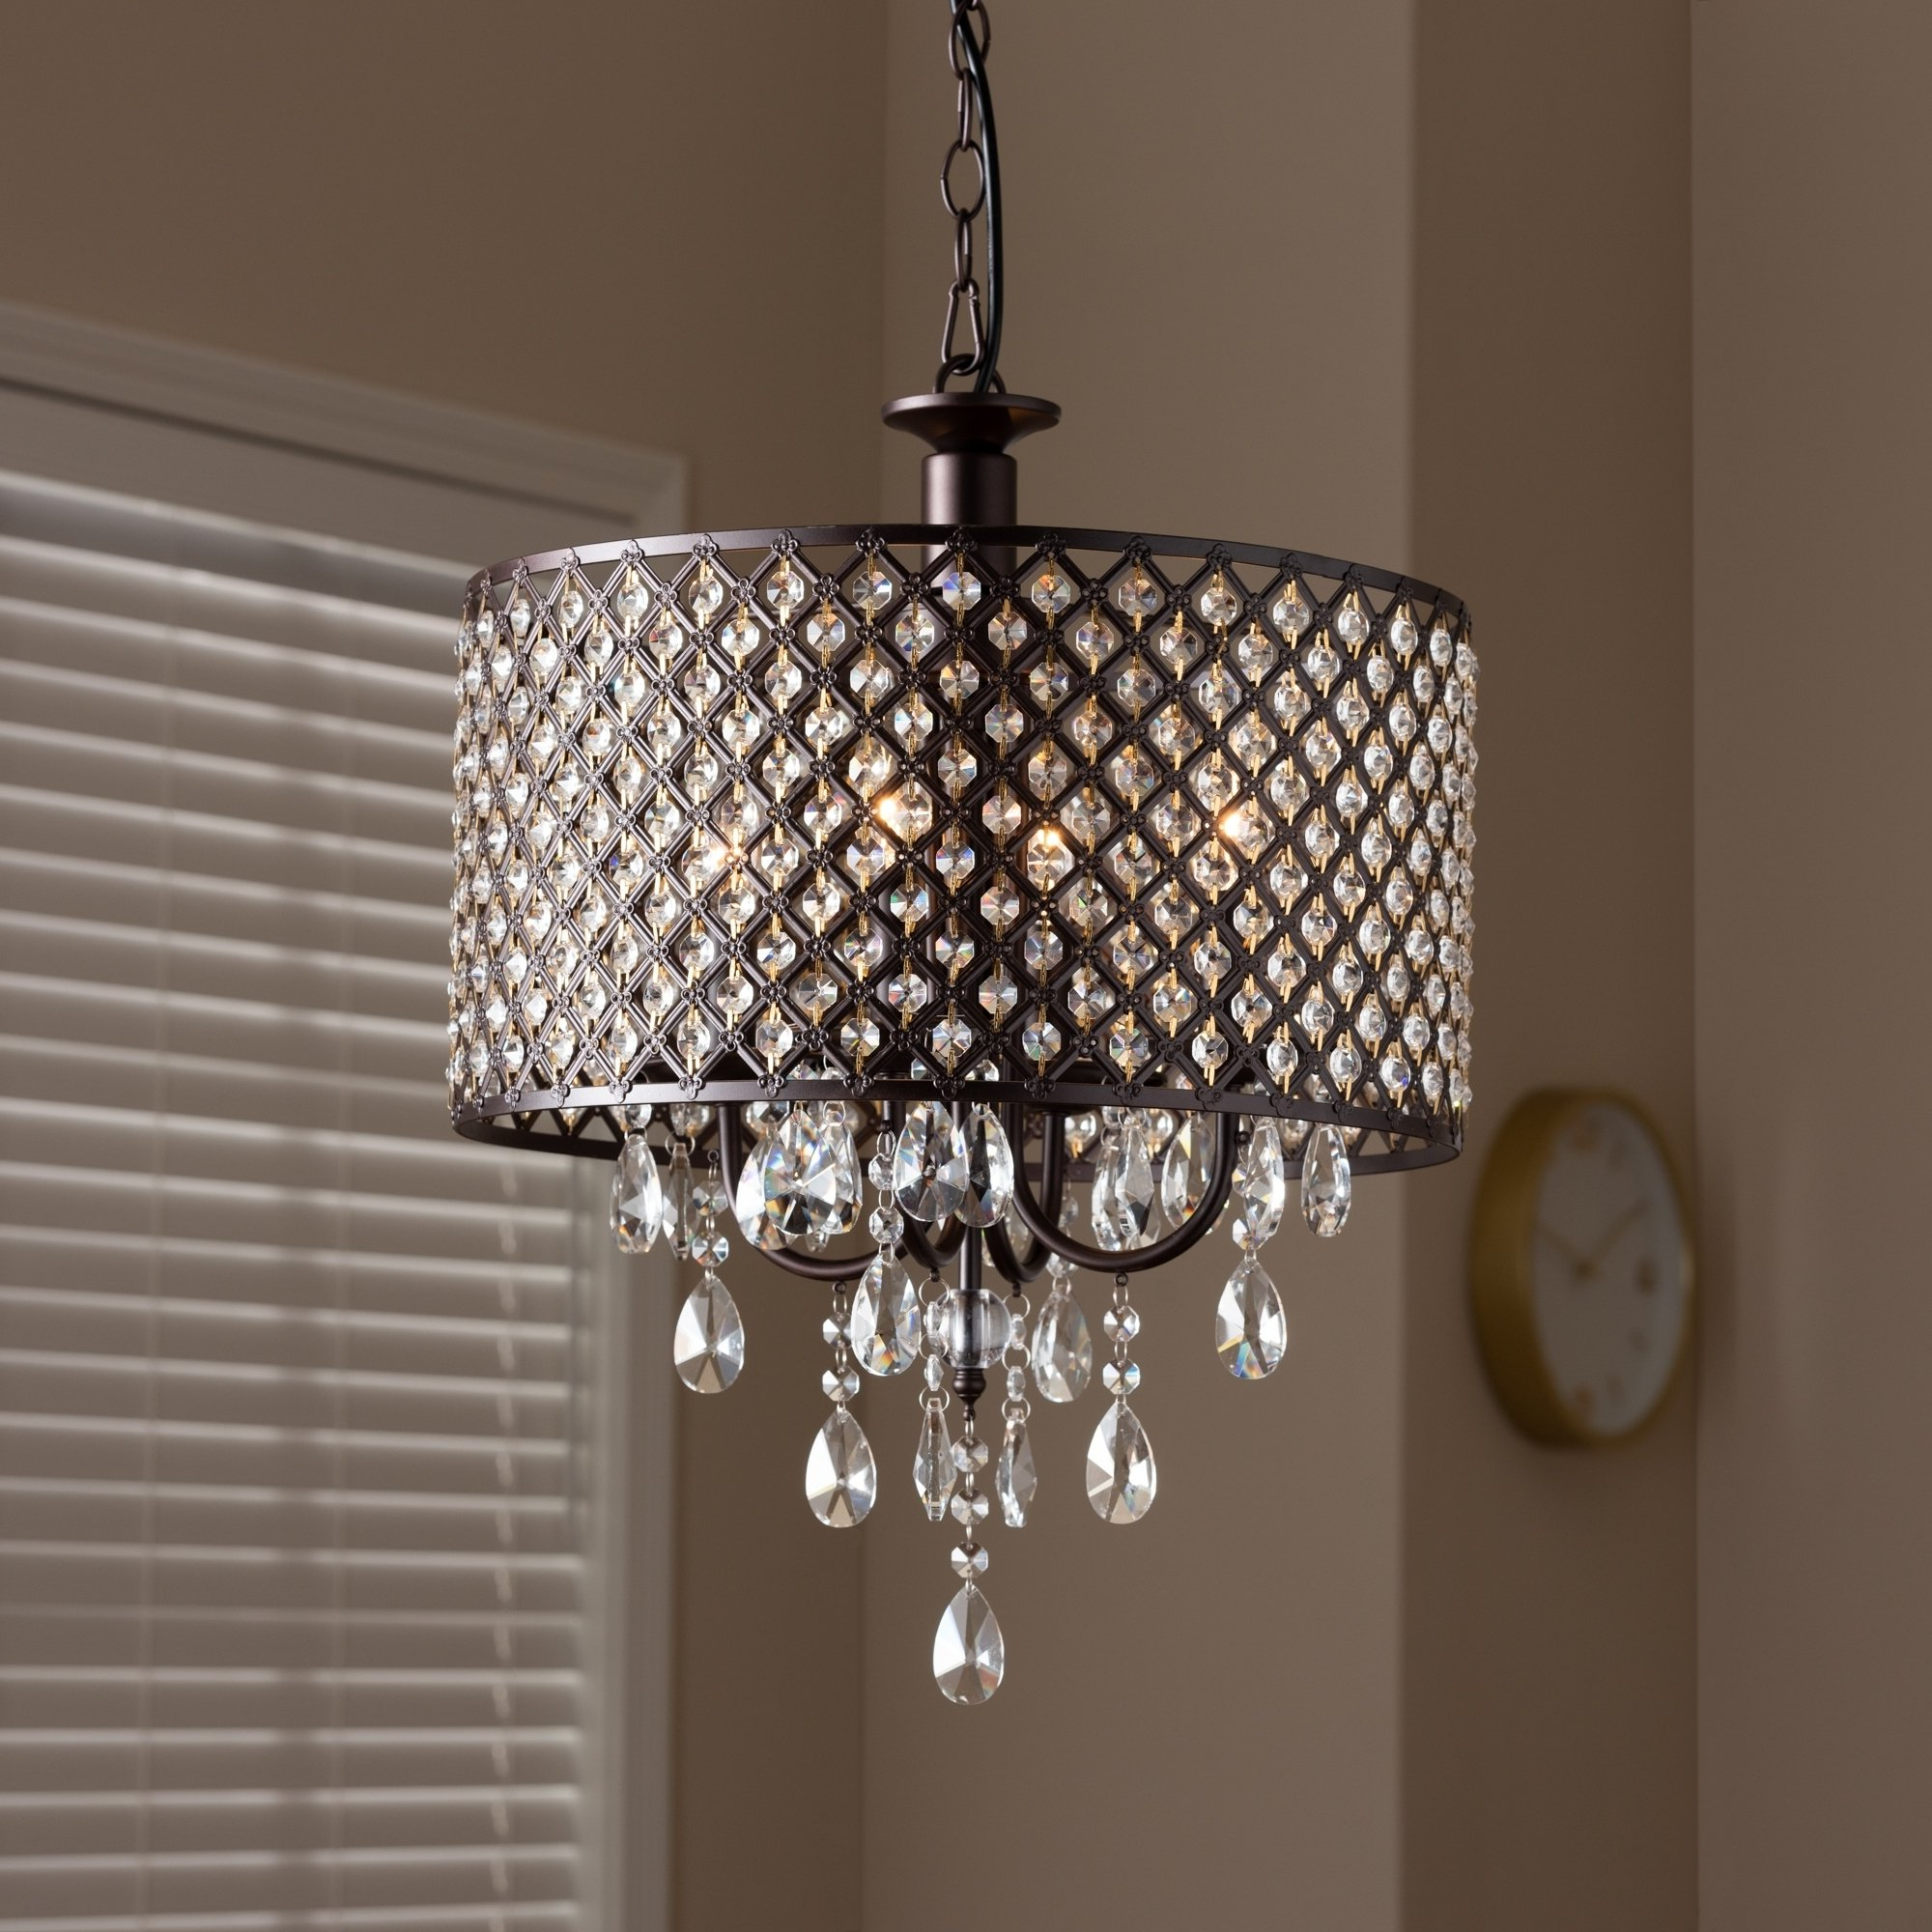 Aldgate 4 Light Crystal Chandeliers Throughout Popular Contemporary Dark Bronze 4 Light Drum Pendant Light (View 5 of 25)